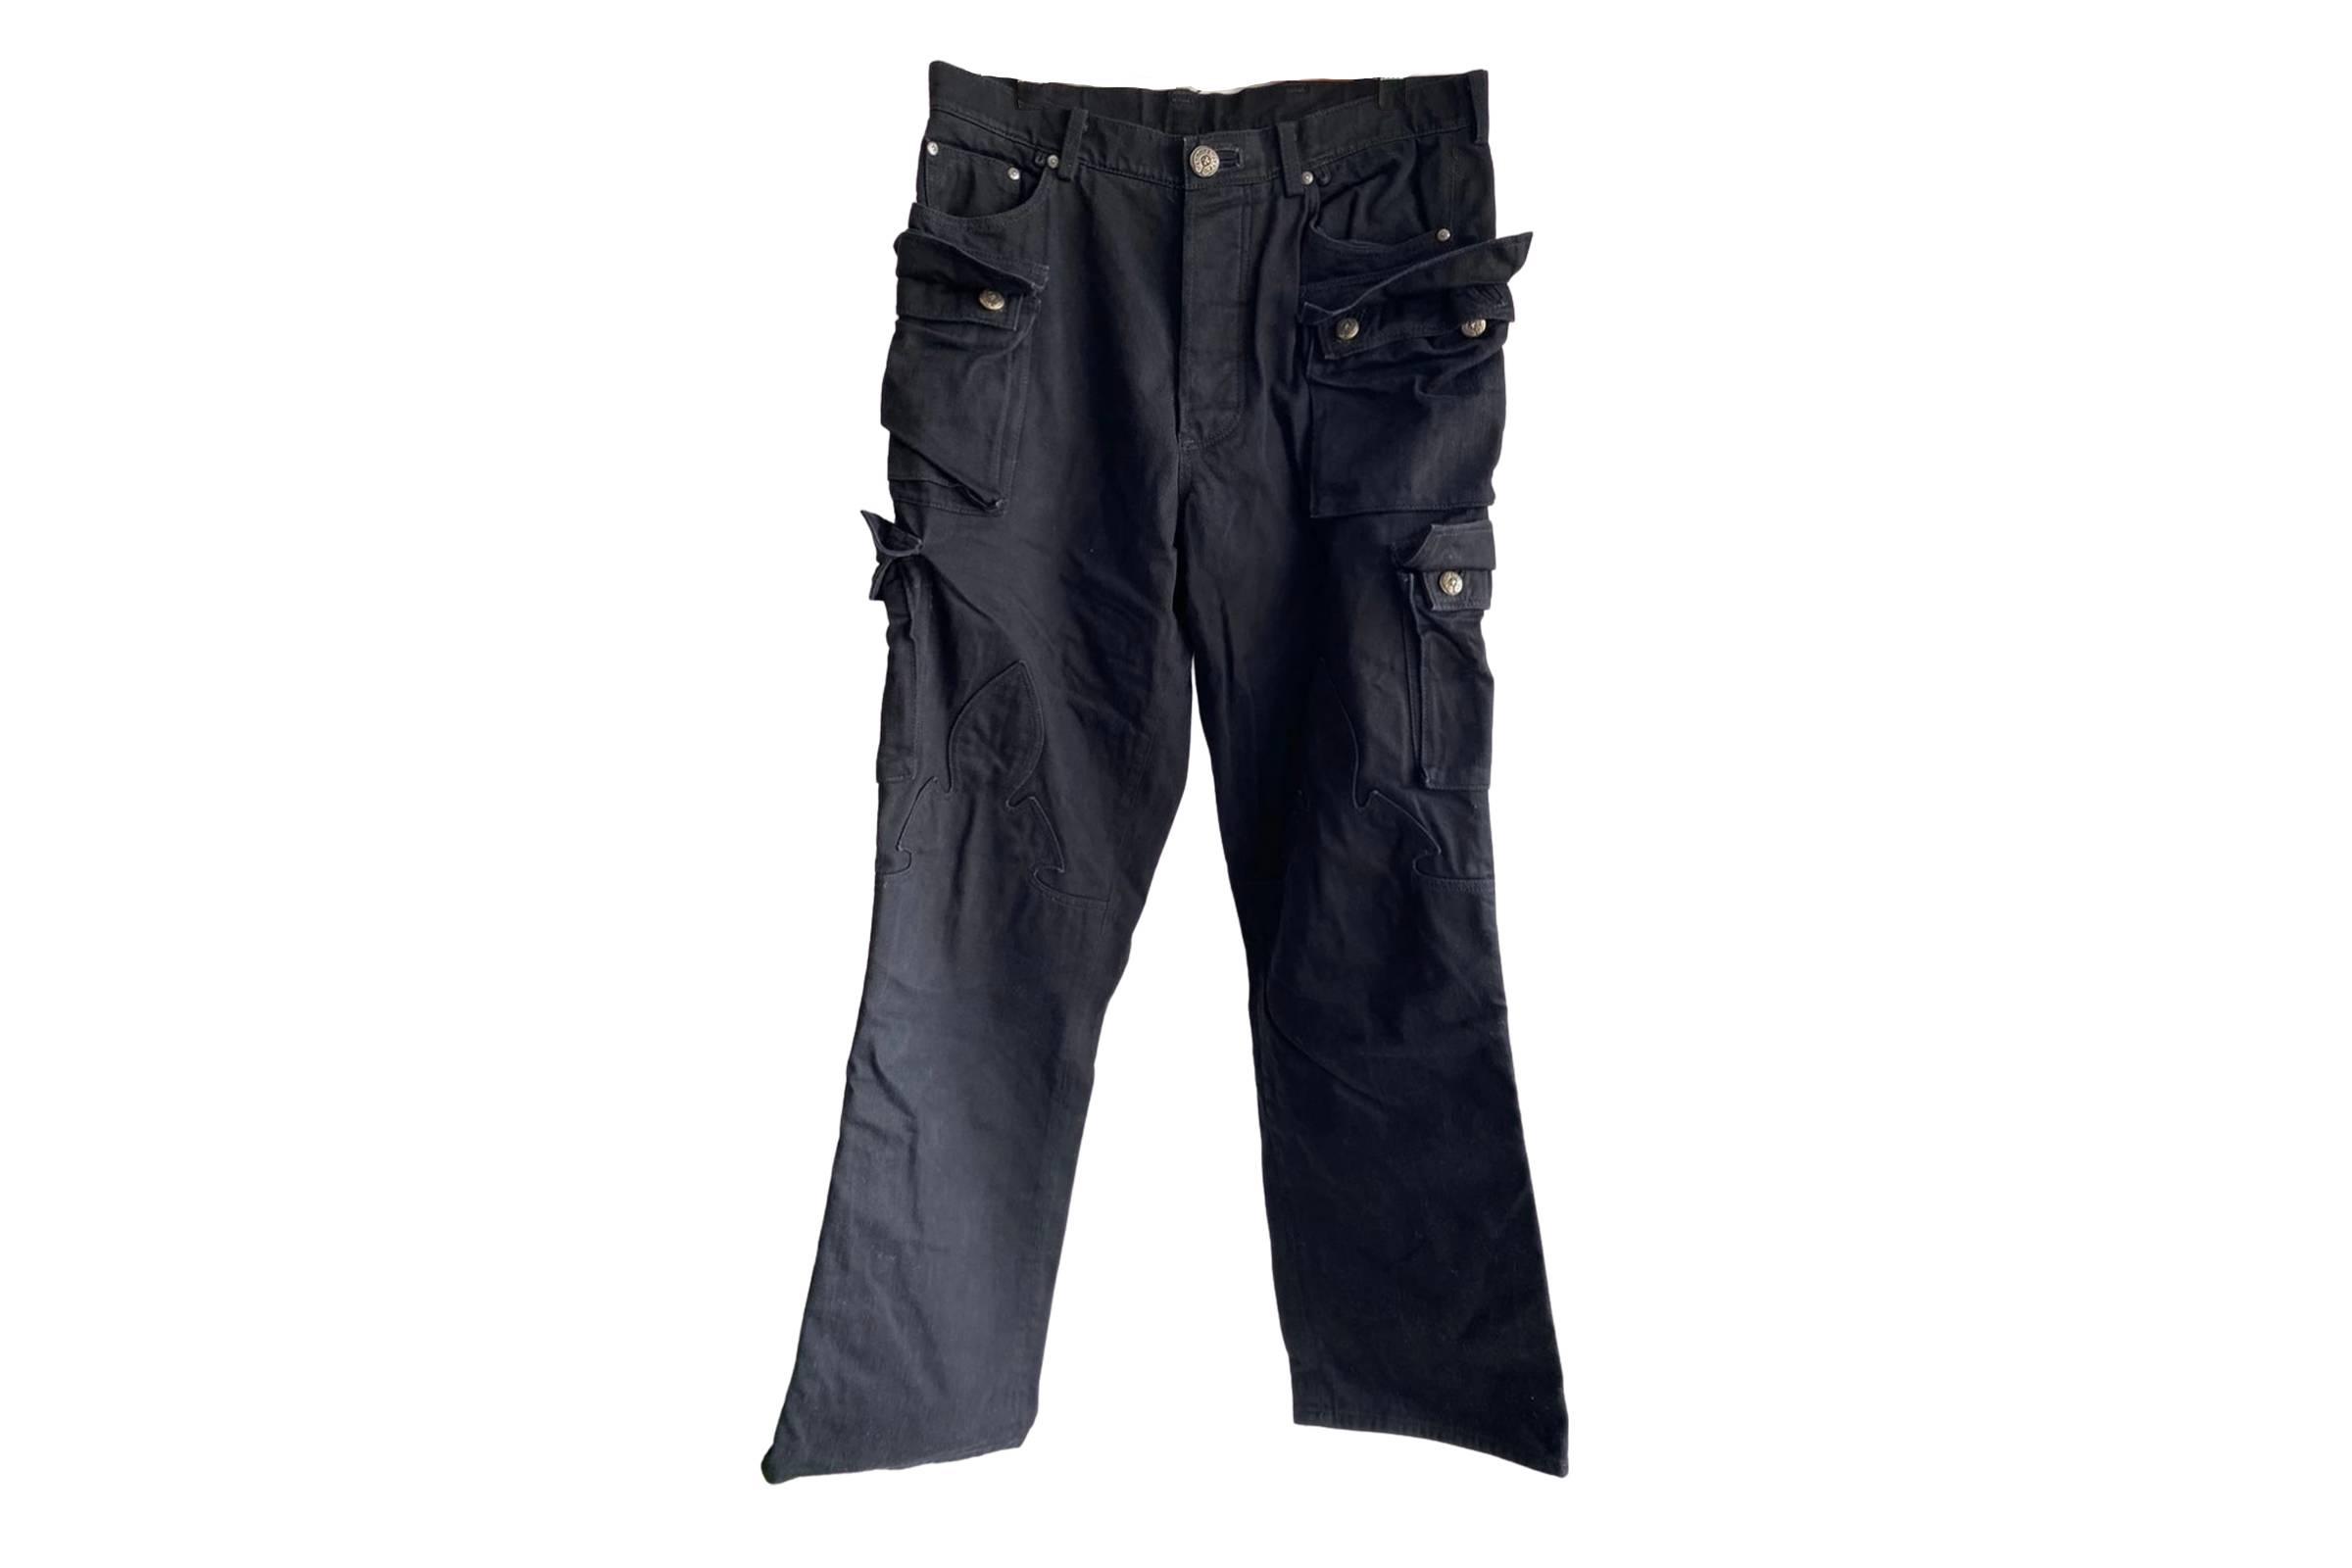 Chrome Hearts Cargo Pants